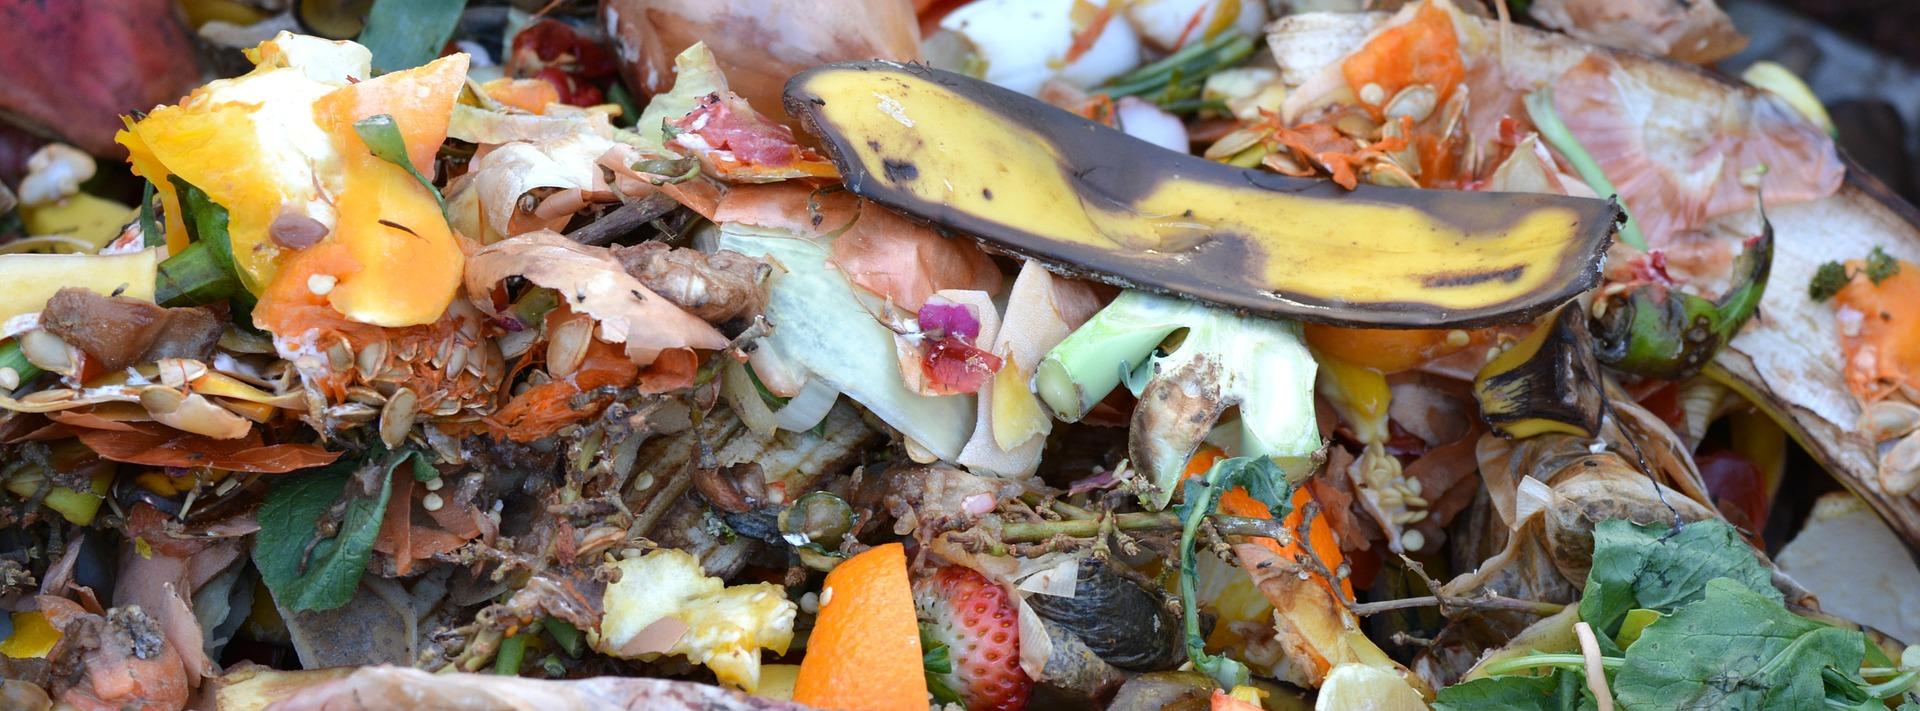 compost-709020_1920.jpg